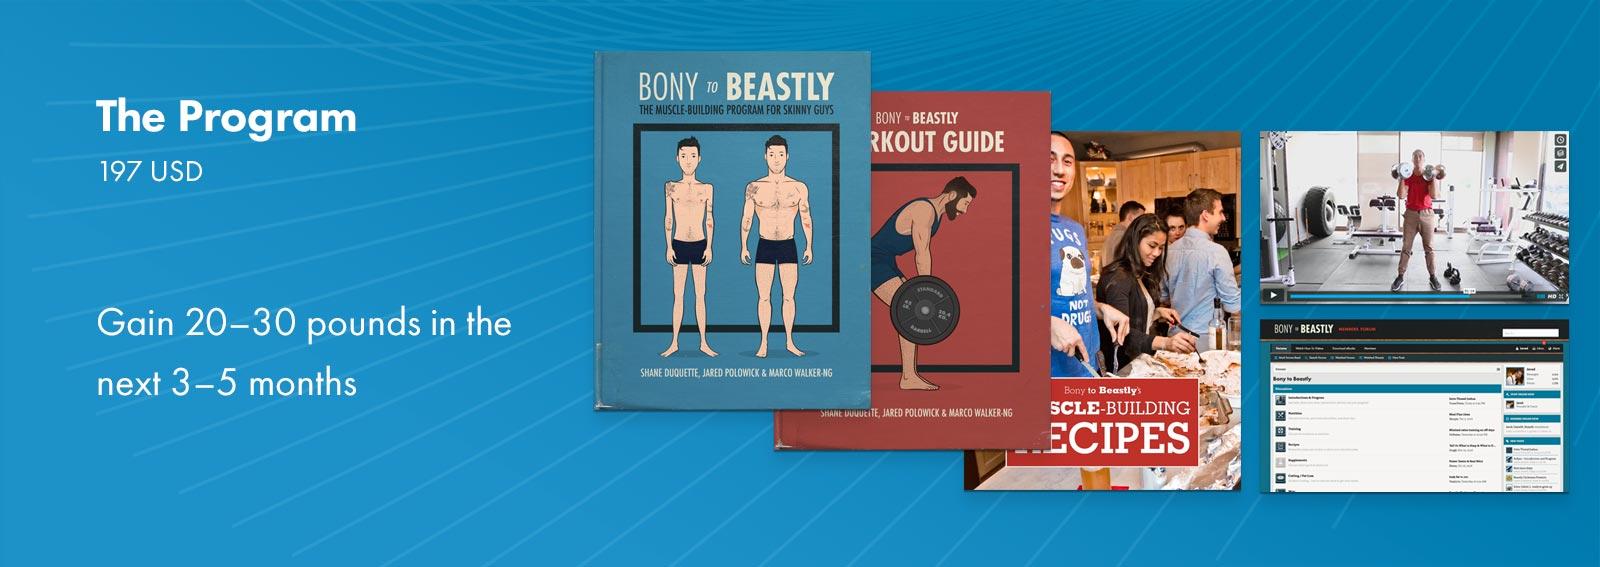 The Bony to Beastly Program